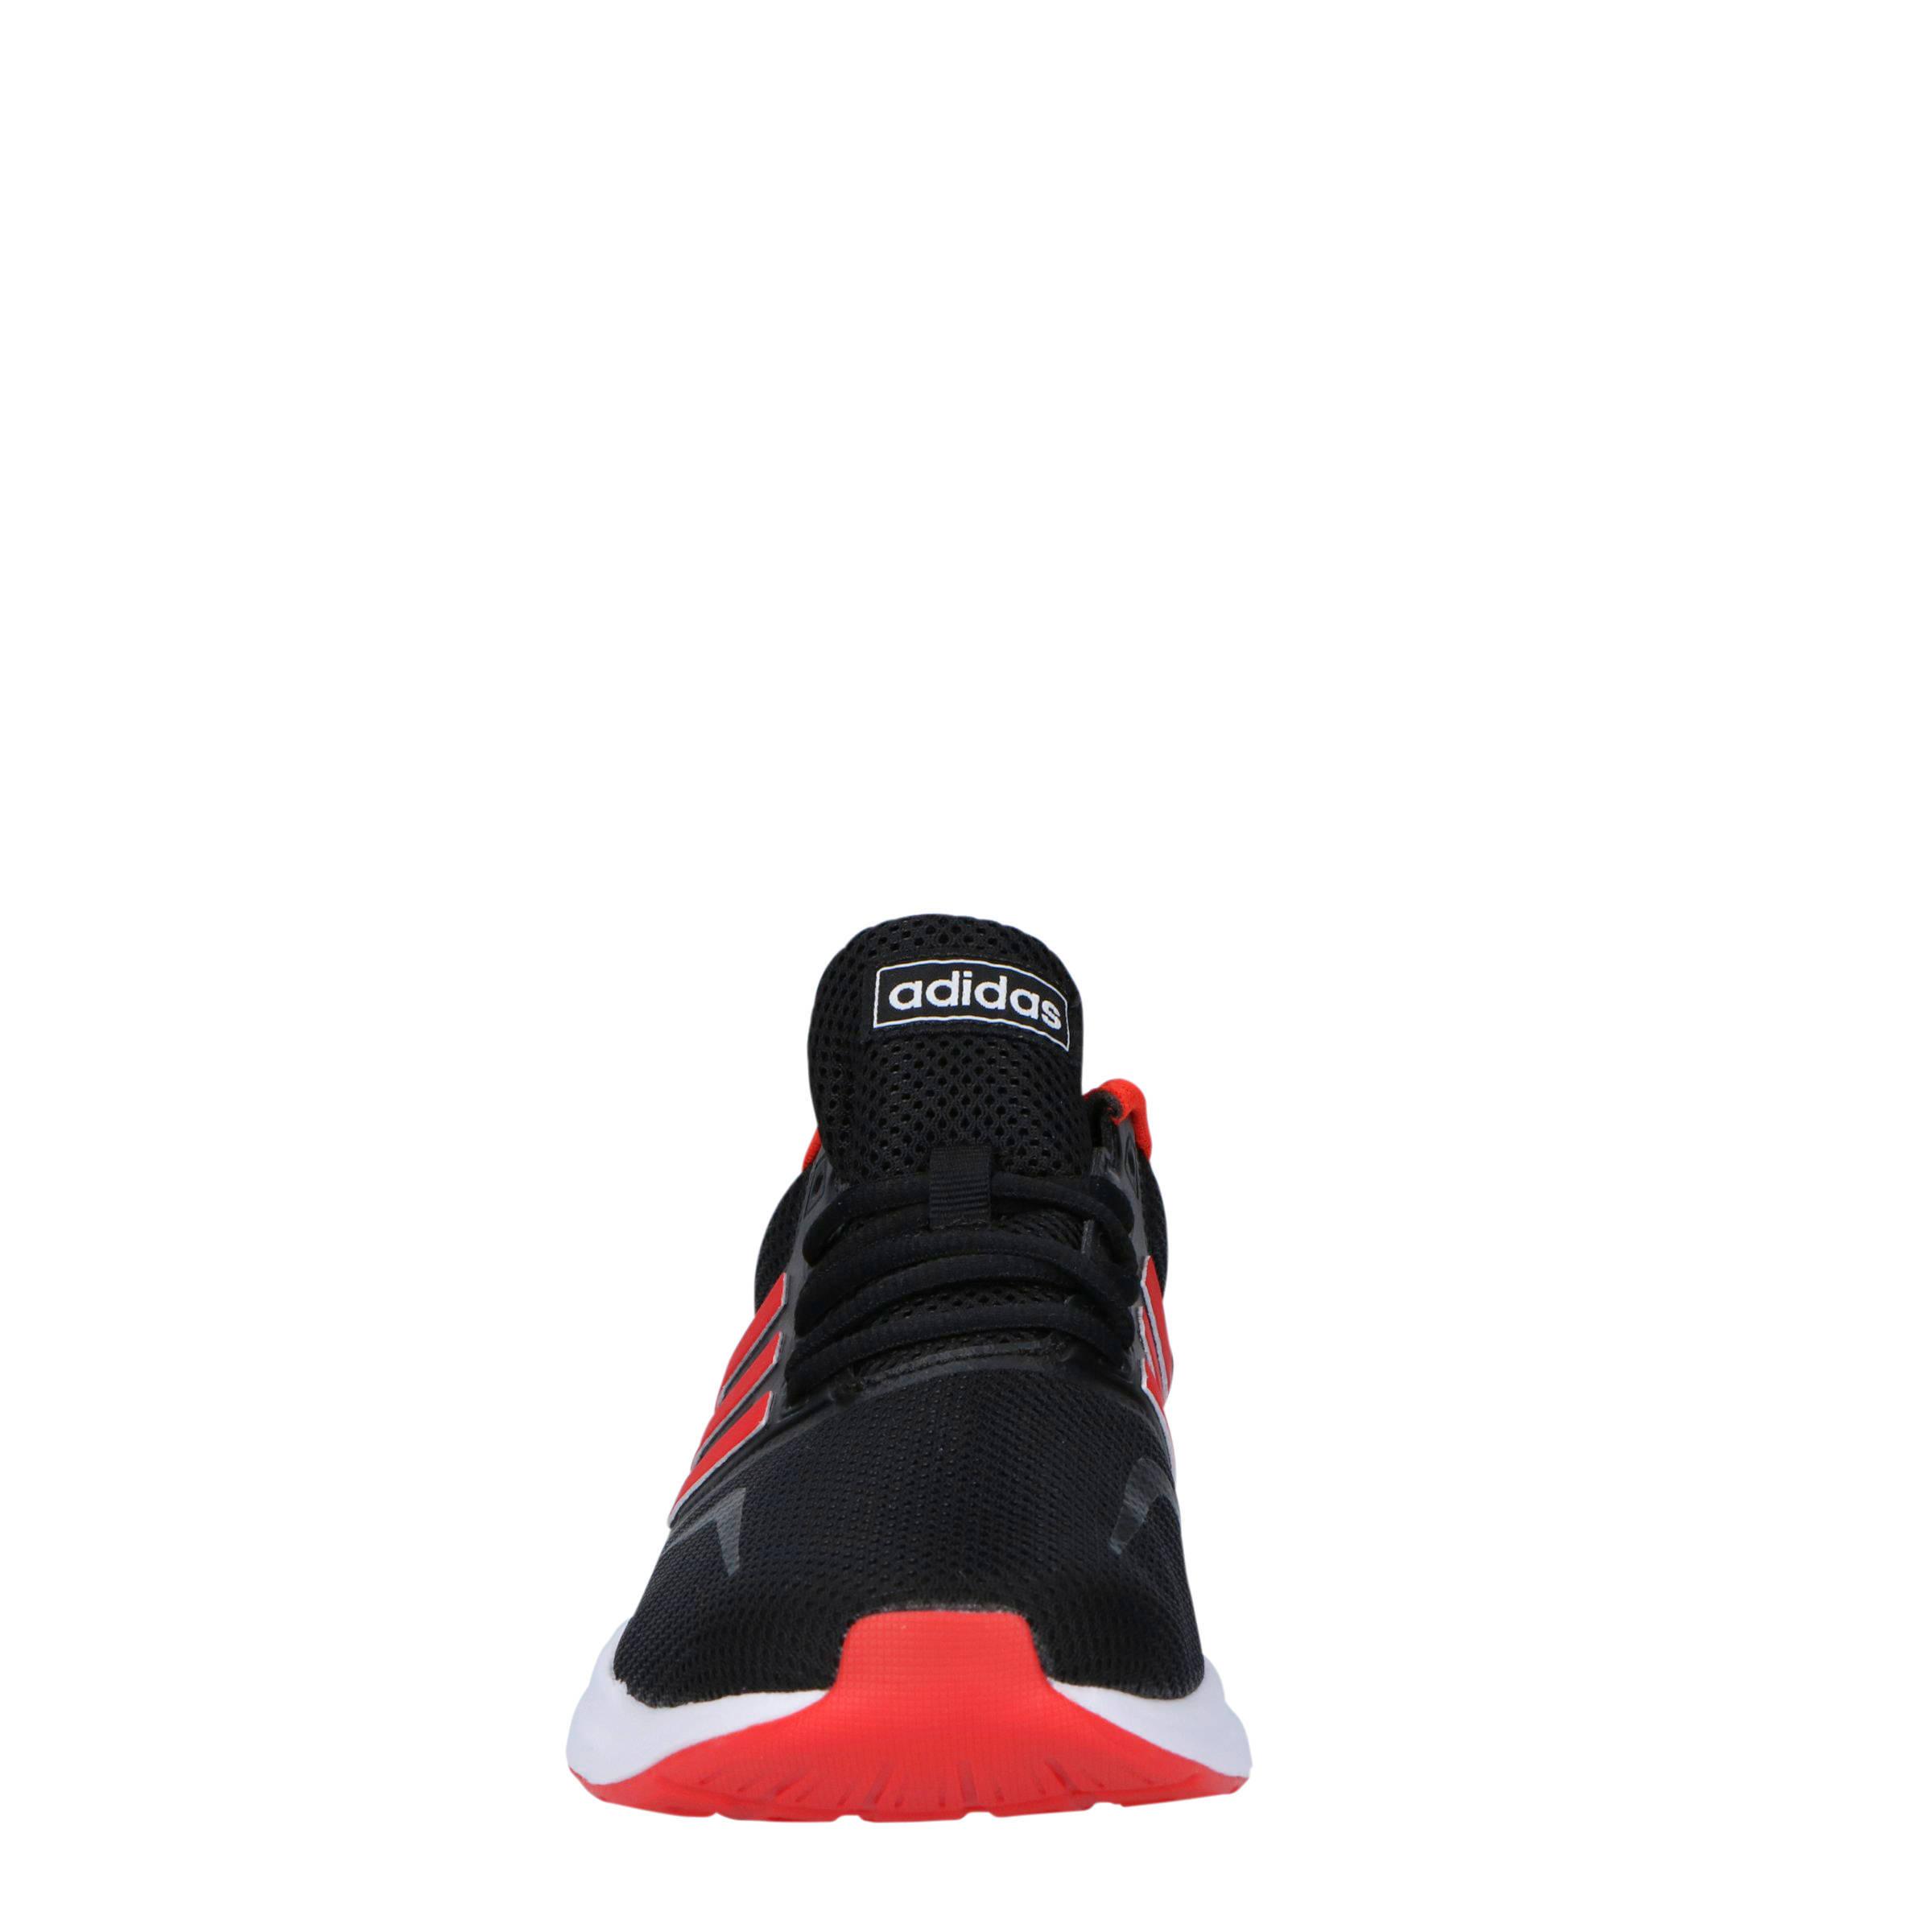 Adidas performance Runfalcon hardloopschoenen blauw Blauw 48